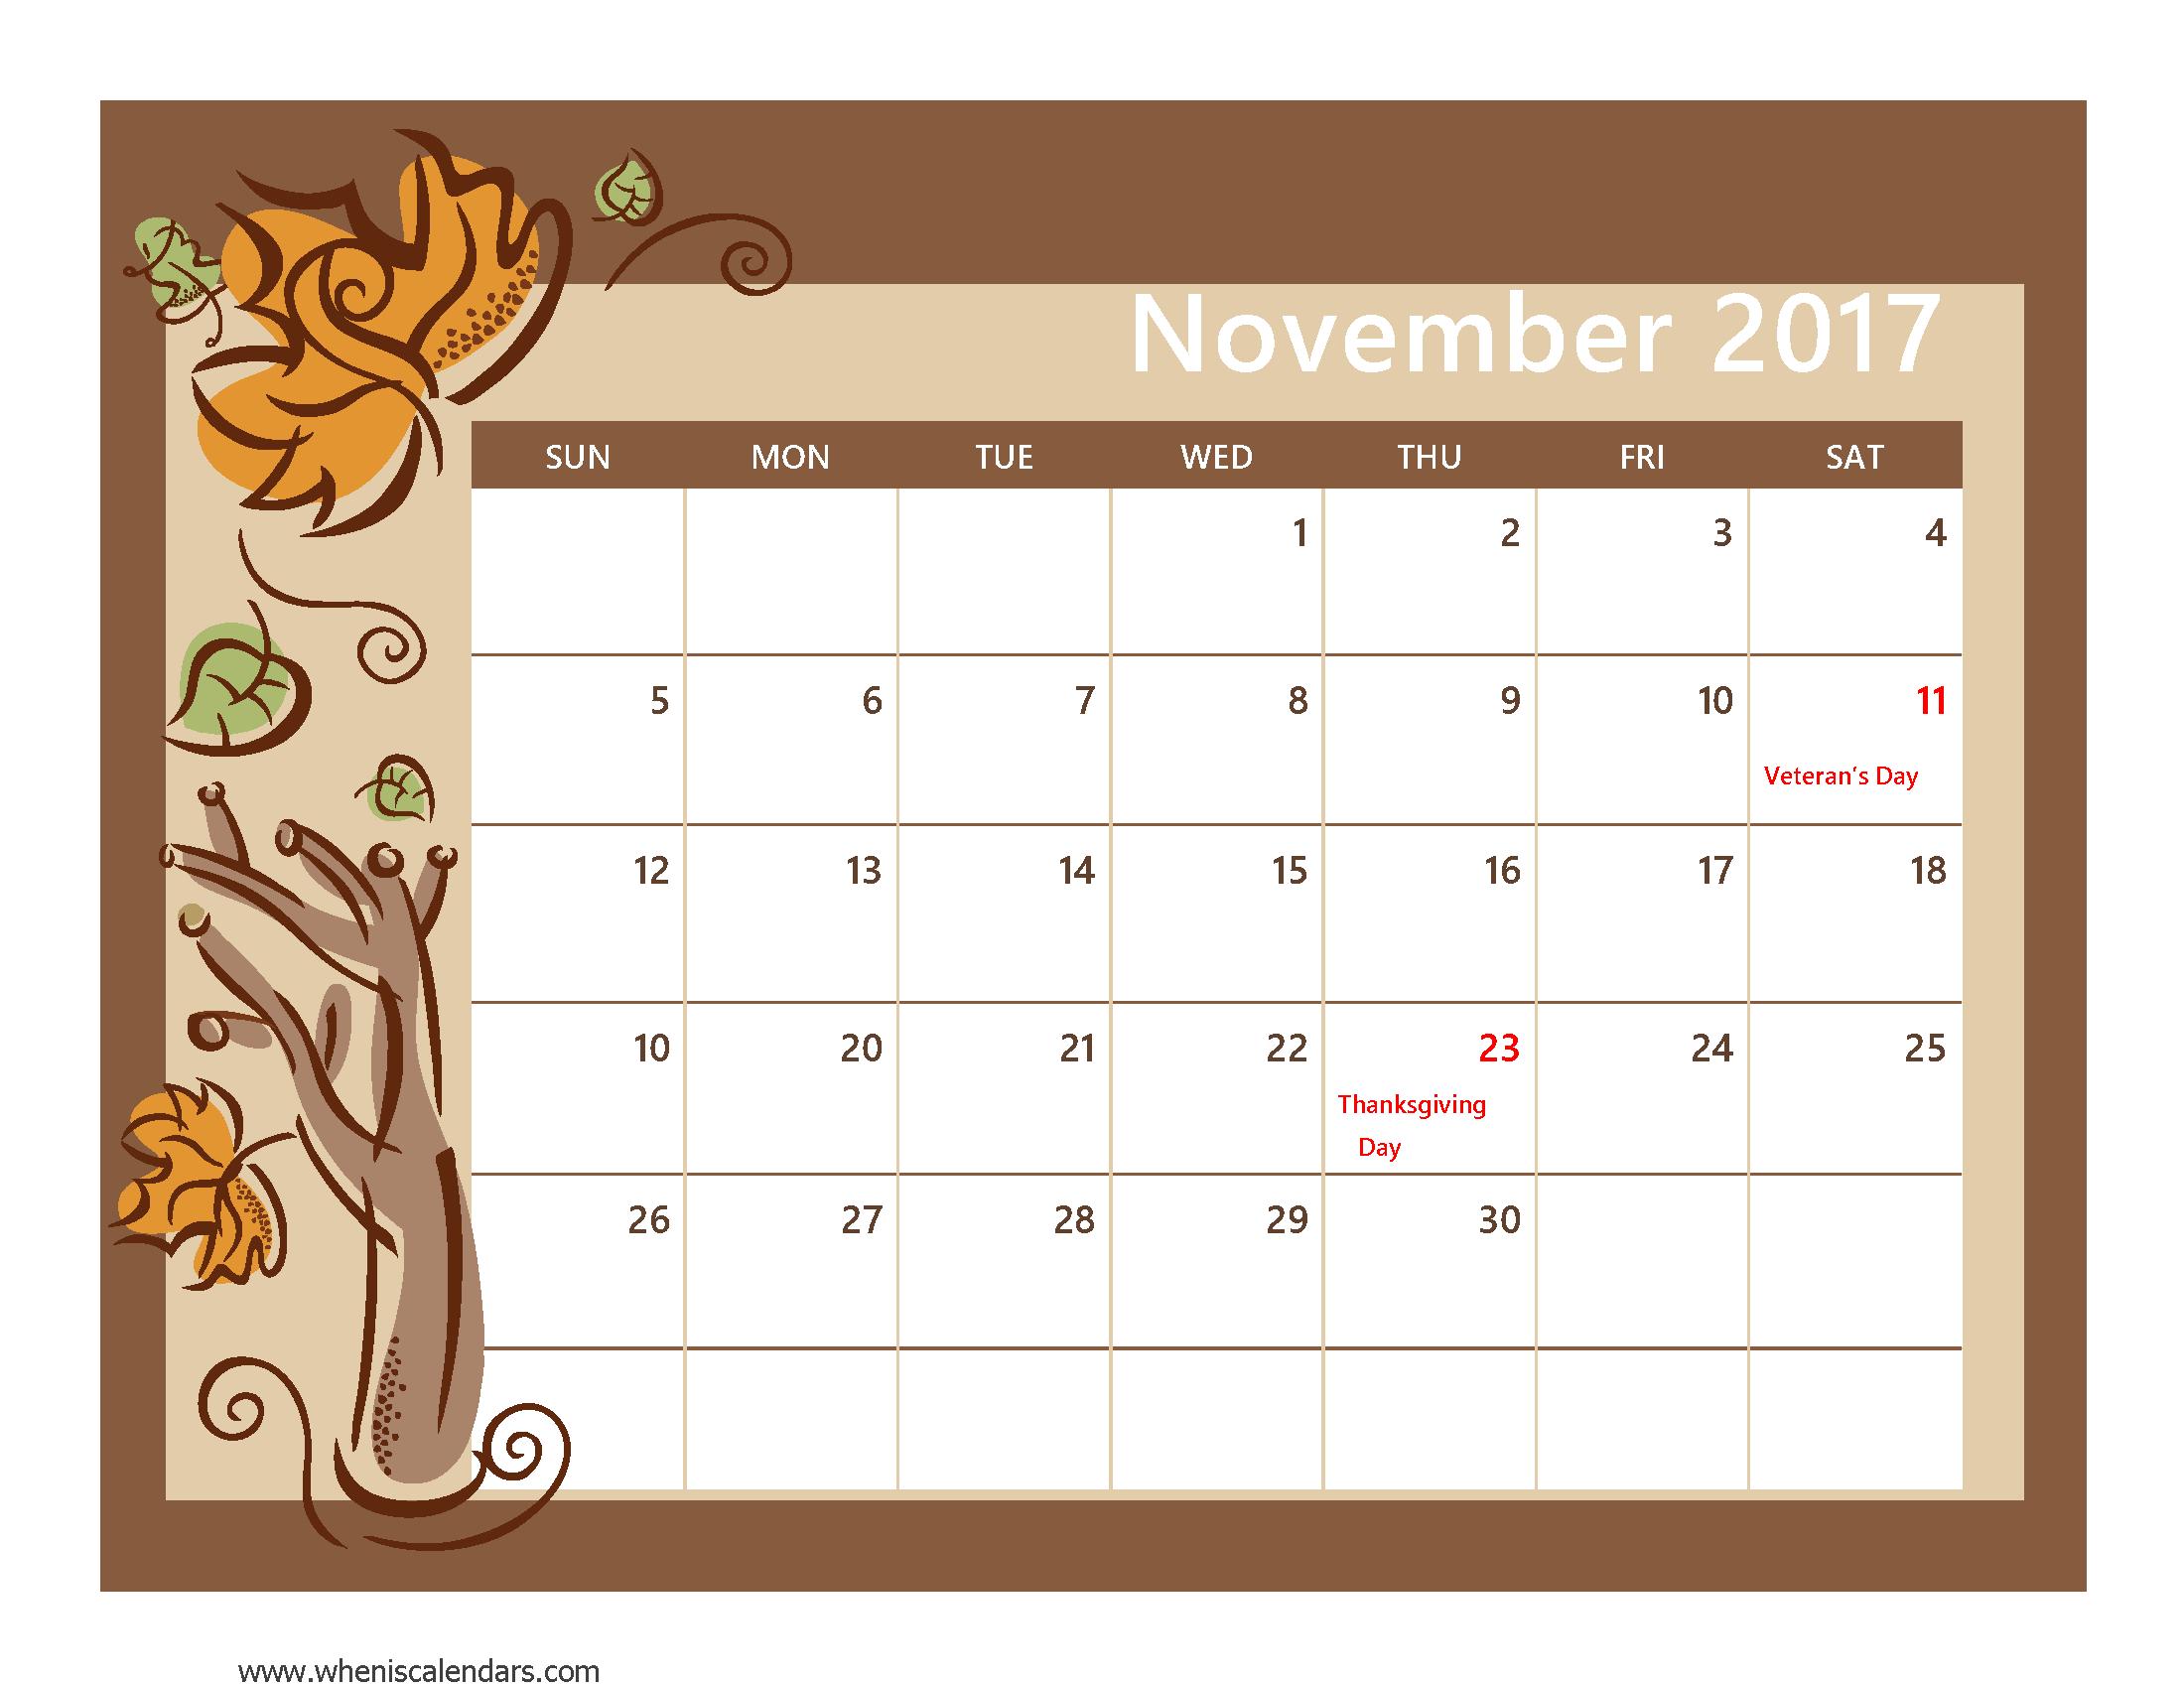 November 2017 Calendar With Holidays Canada | yearly calendar